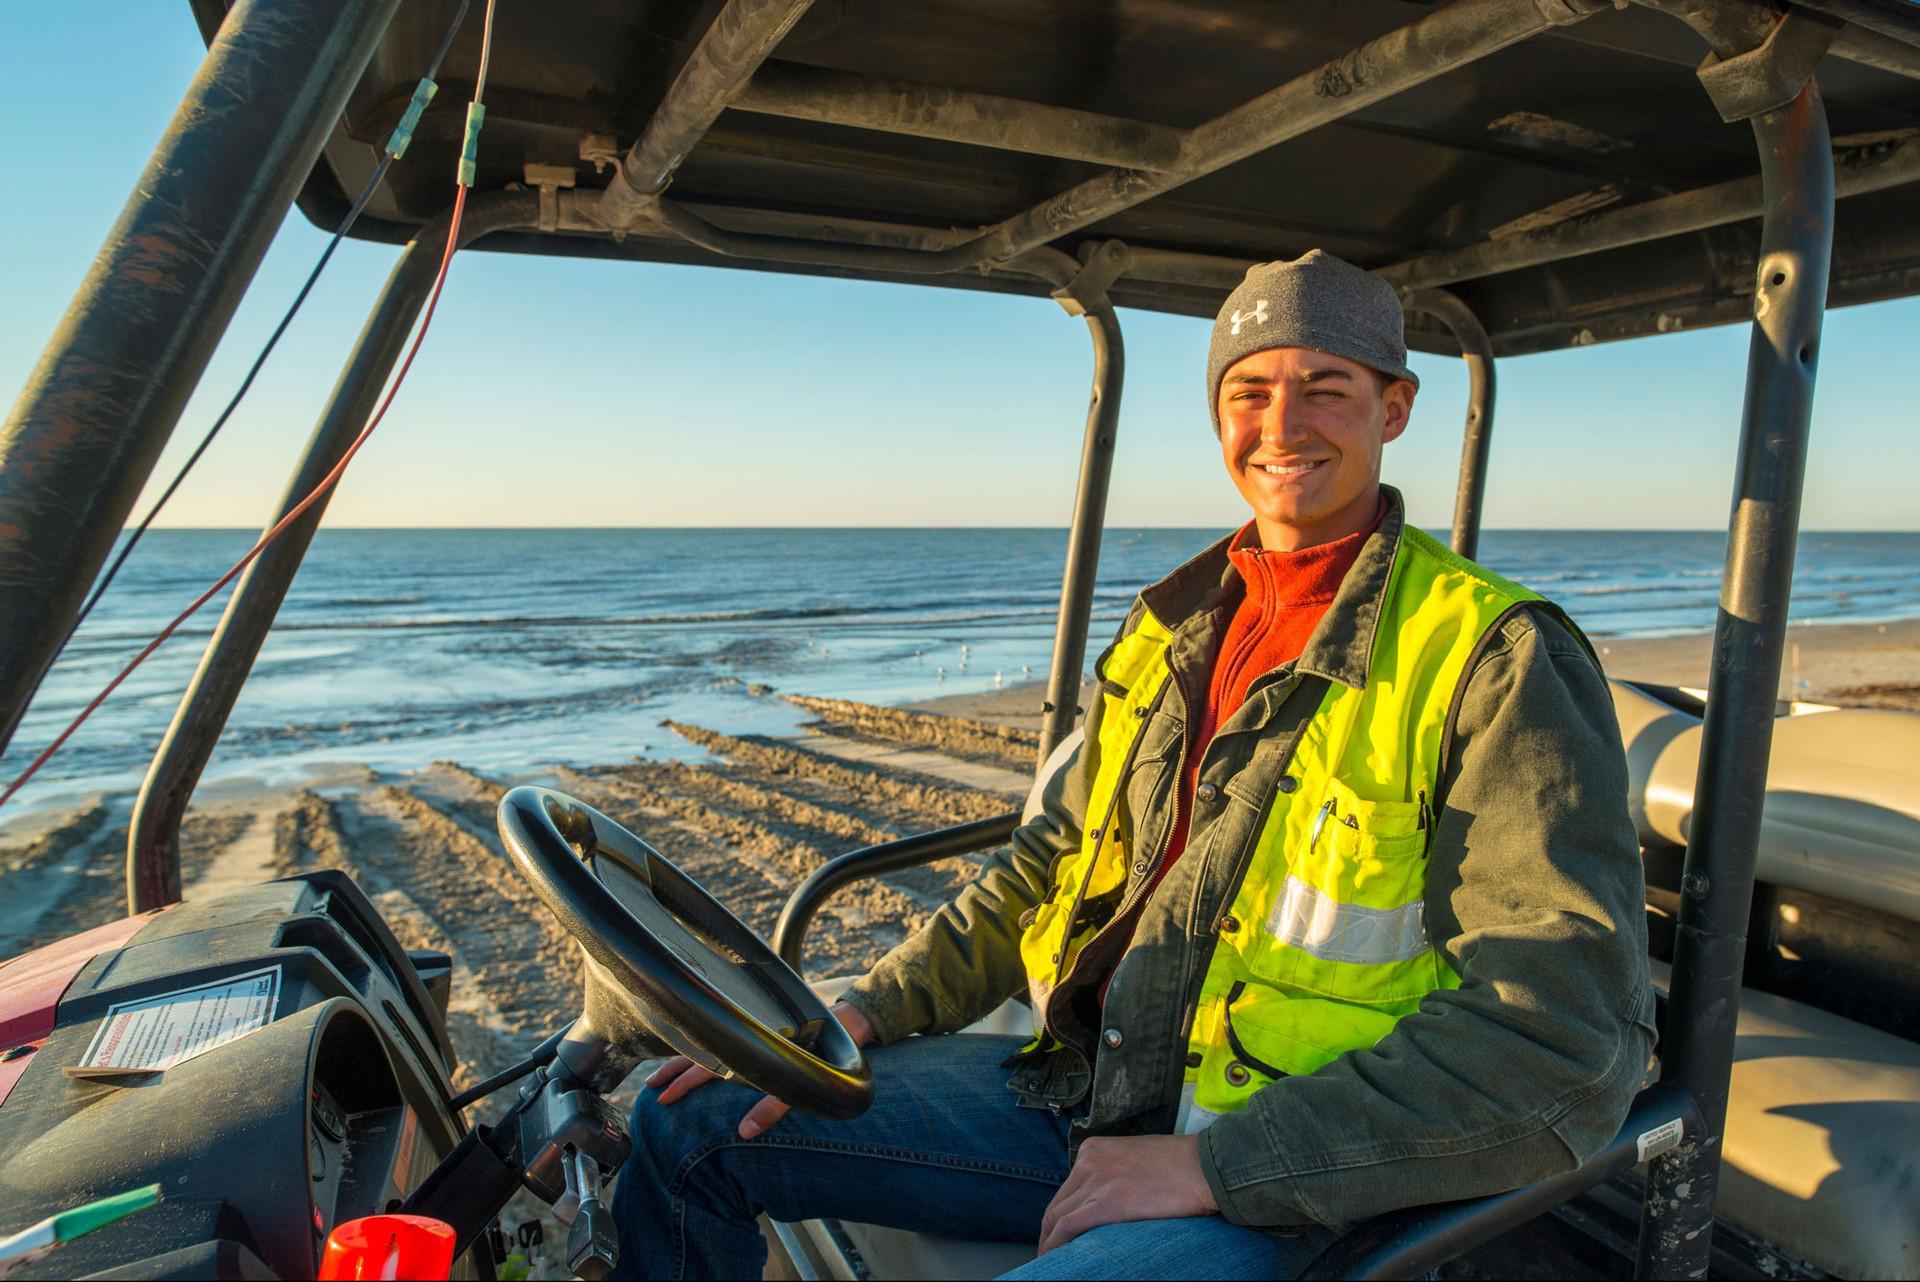 Portrait of a Beach Builder